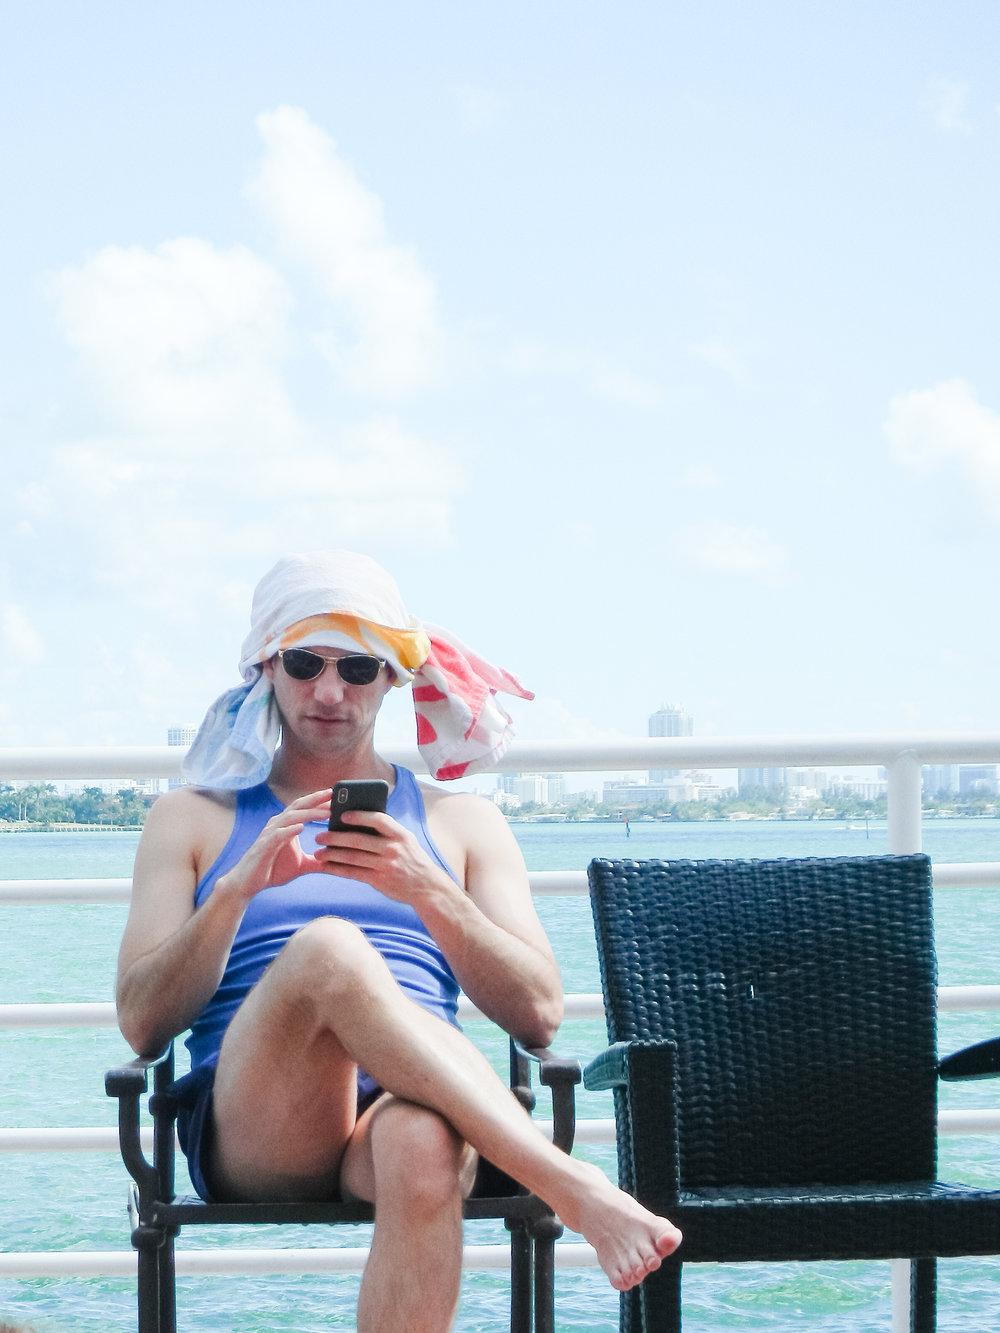 Miami_blog_DSCN0619_20180217_23.jpg